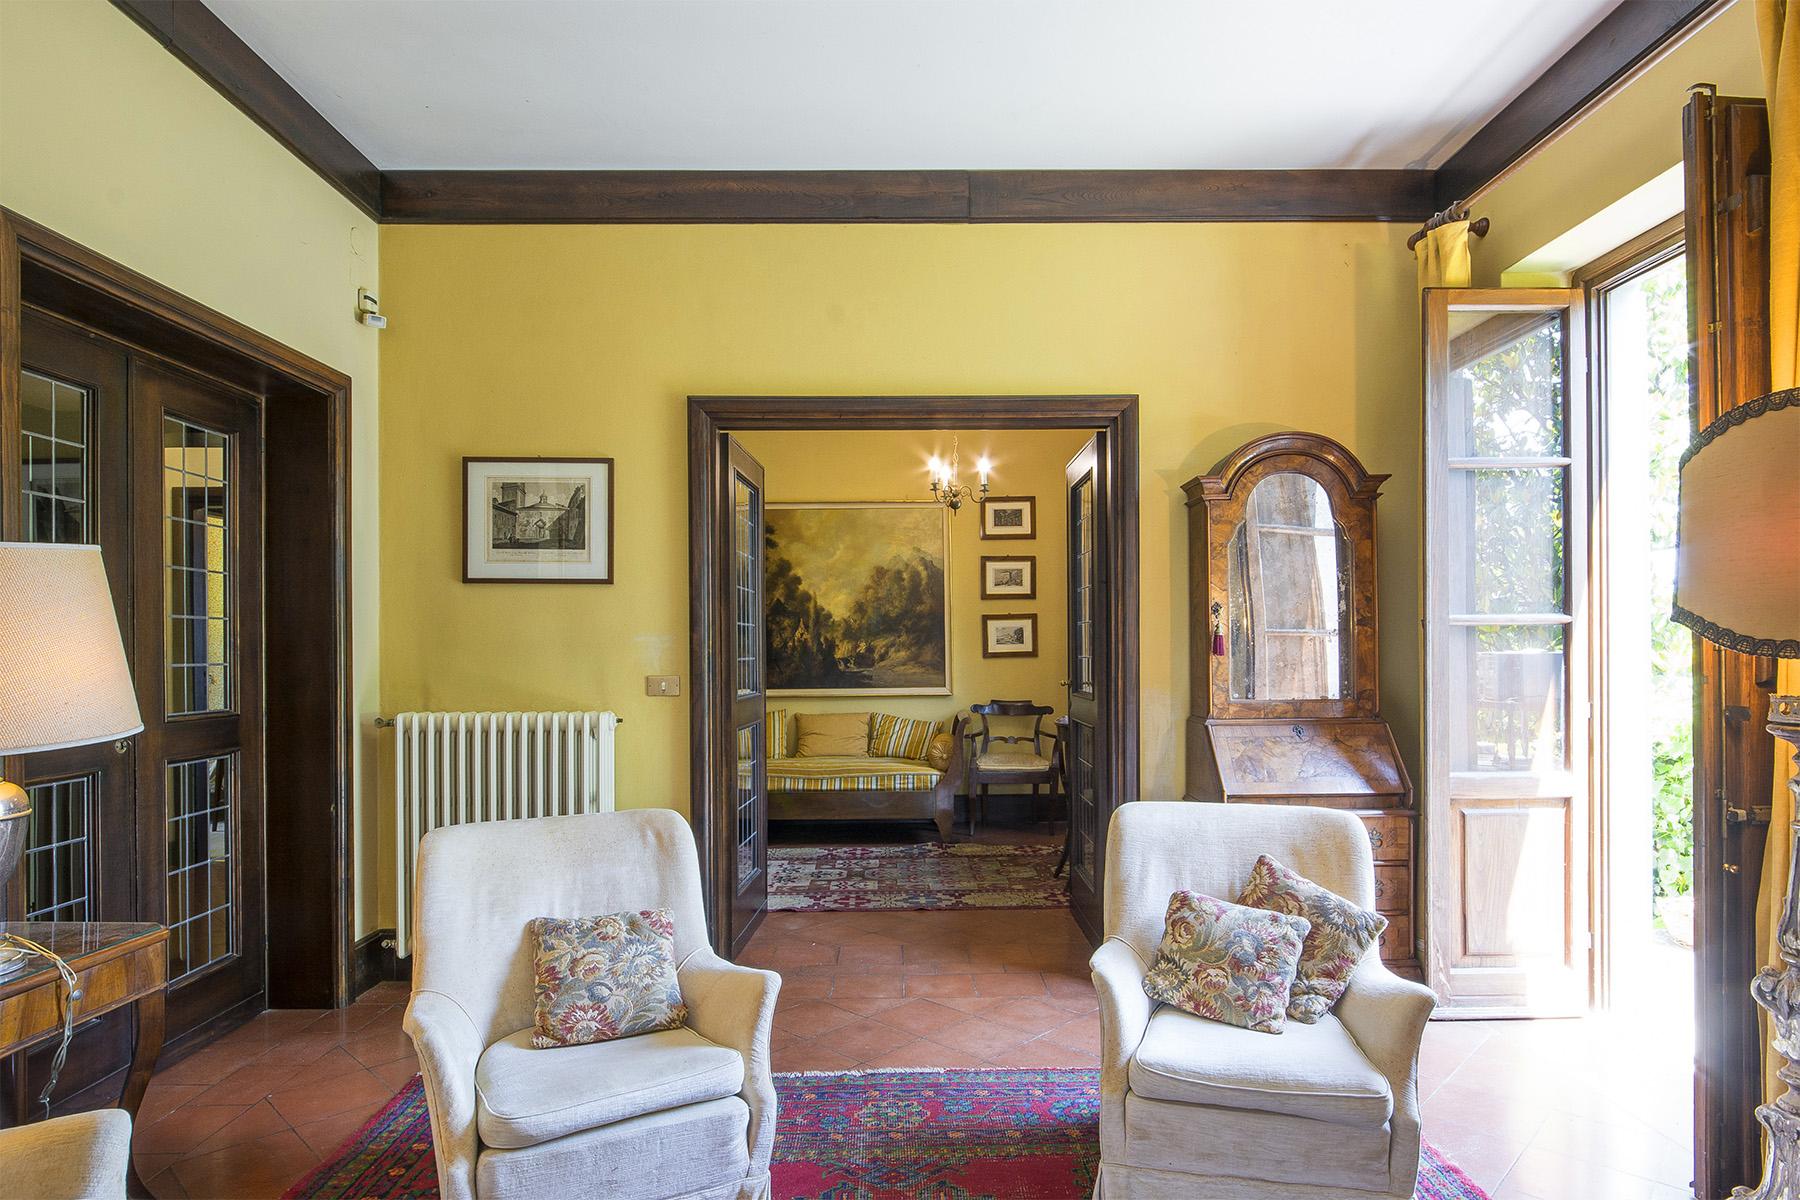 Villa in Vendita a Lucca: 5 locali, 600 mq - Foto 12